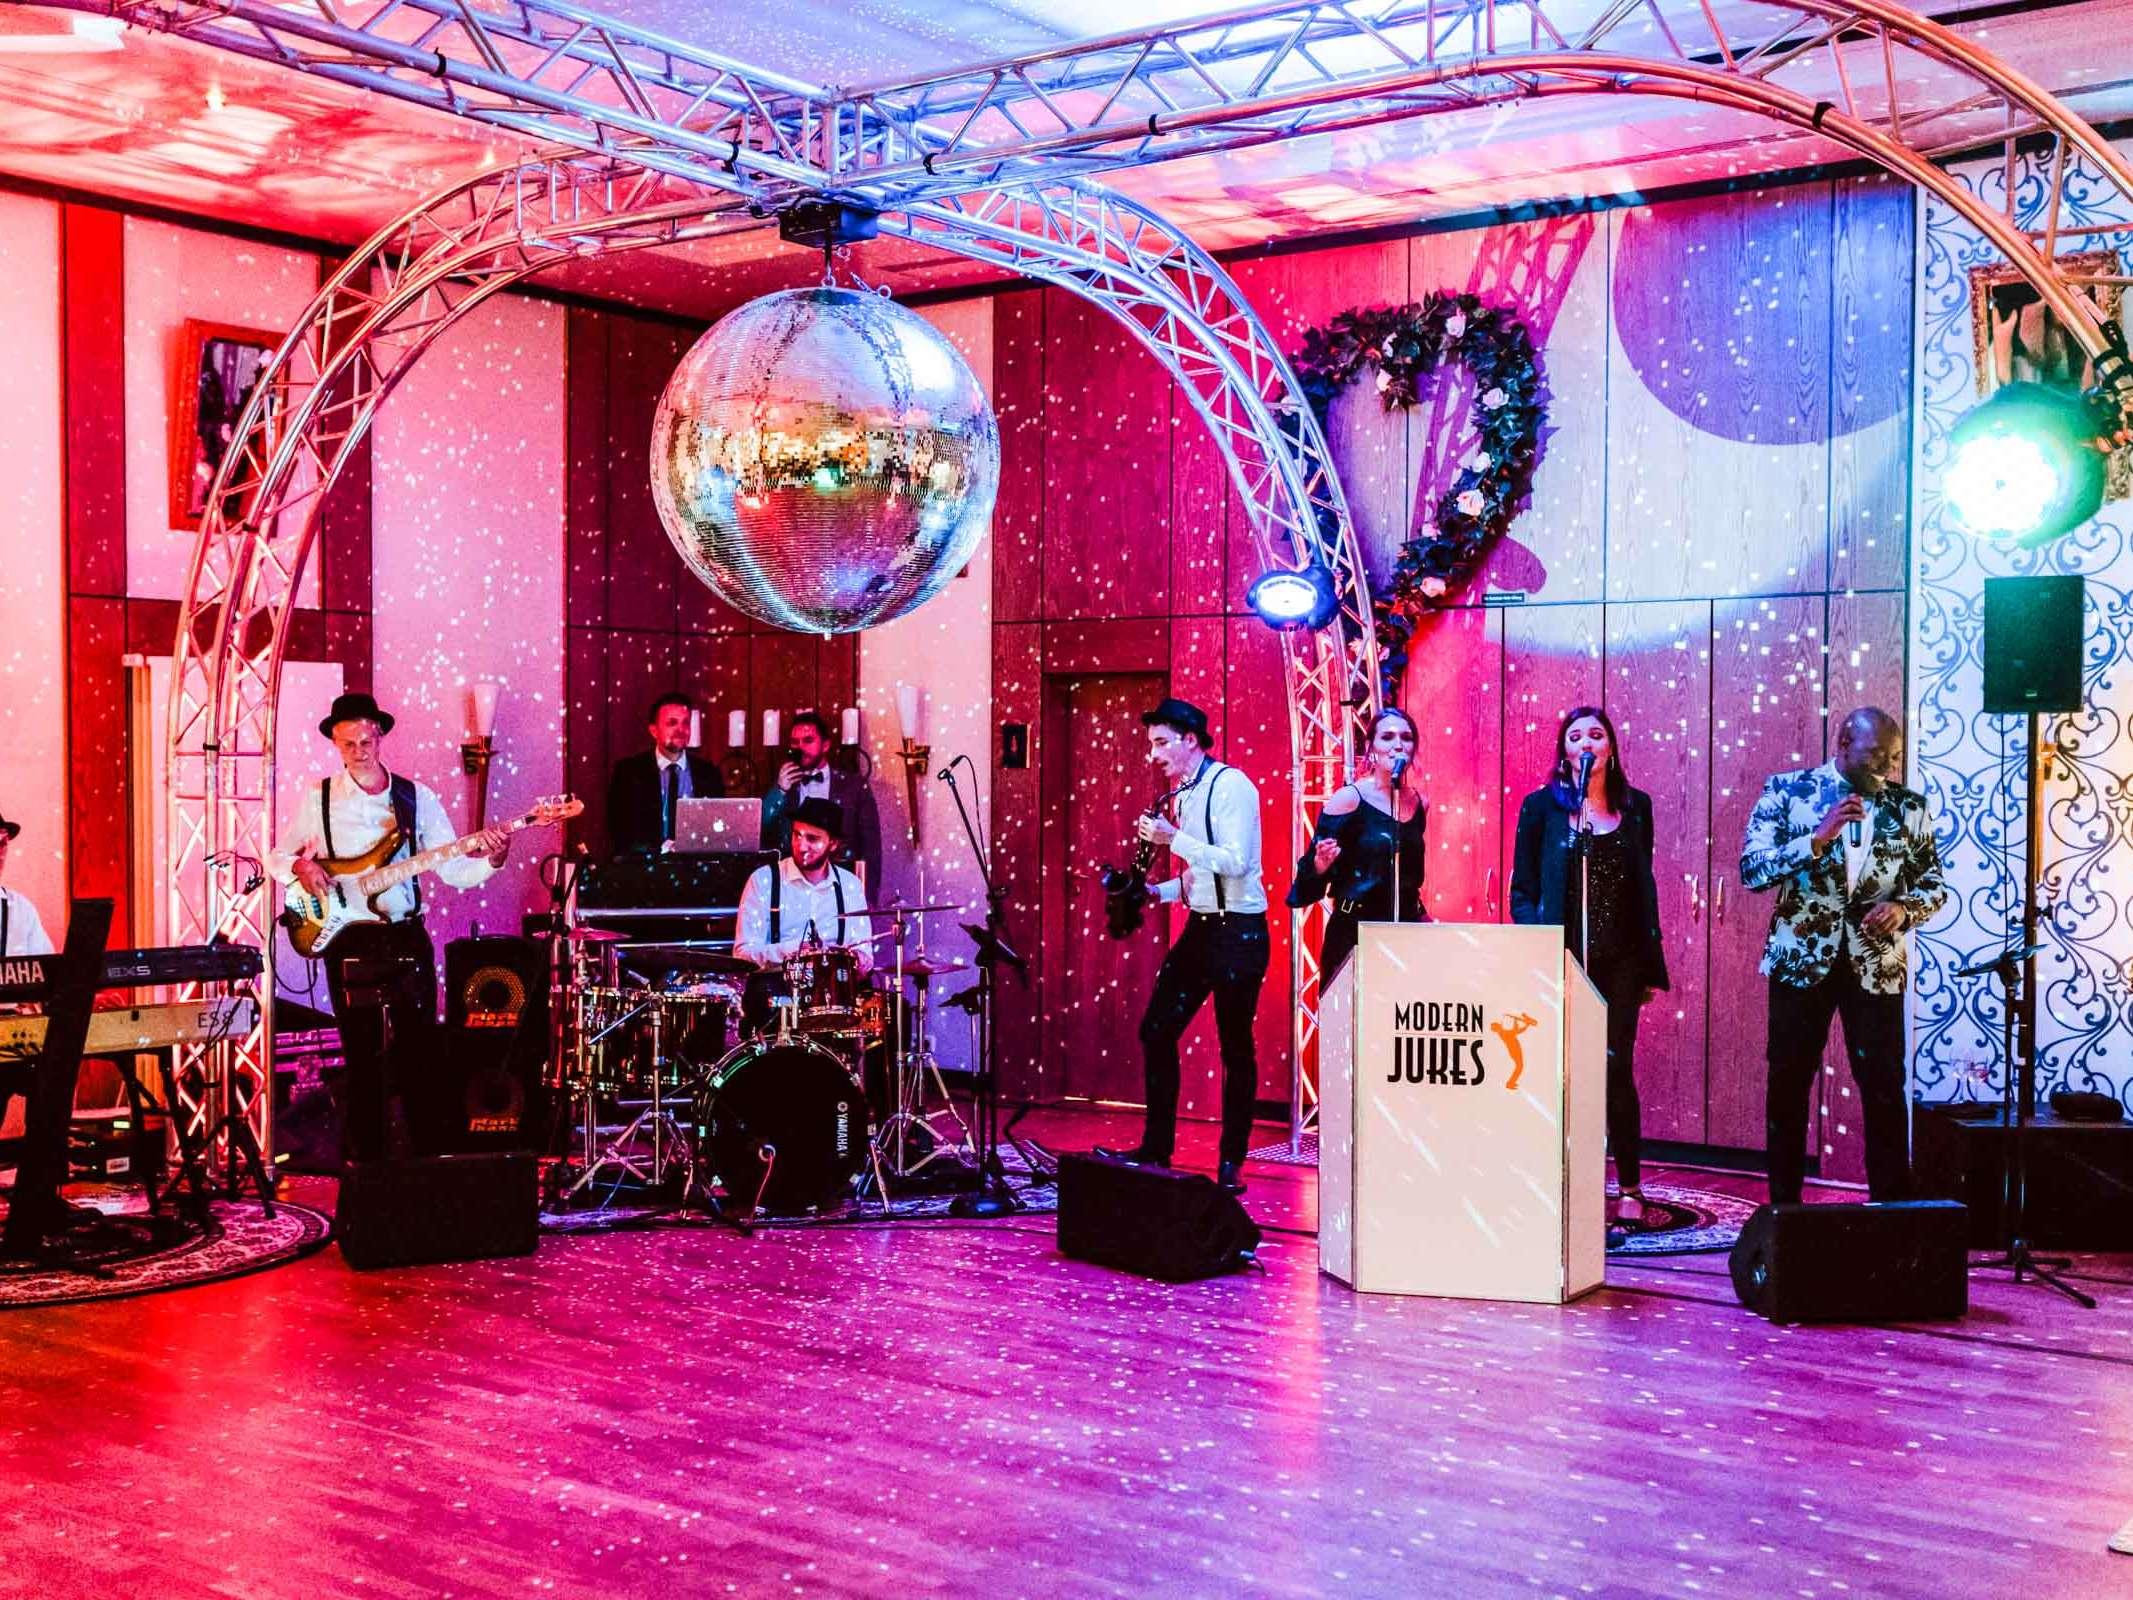 Modern | Jukes | Liveband | Band | Hannover | Swing | Jazz | Hotel | Hennies | Weihnachtsfeier | Show